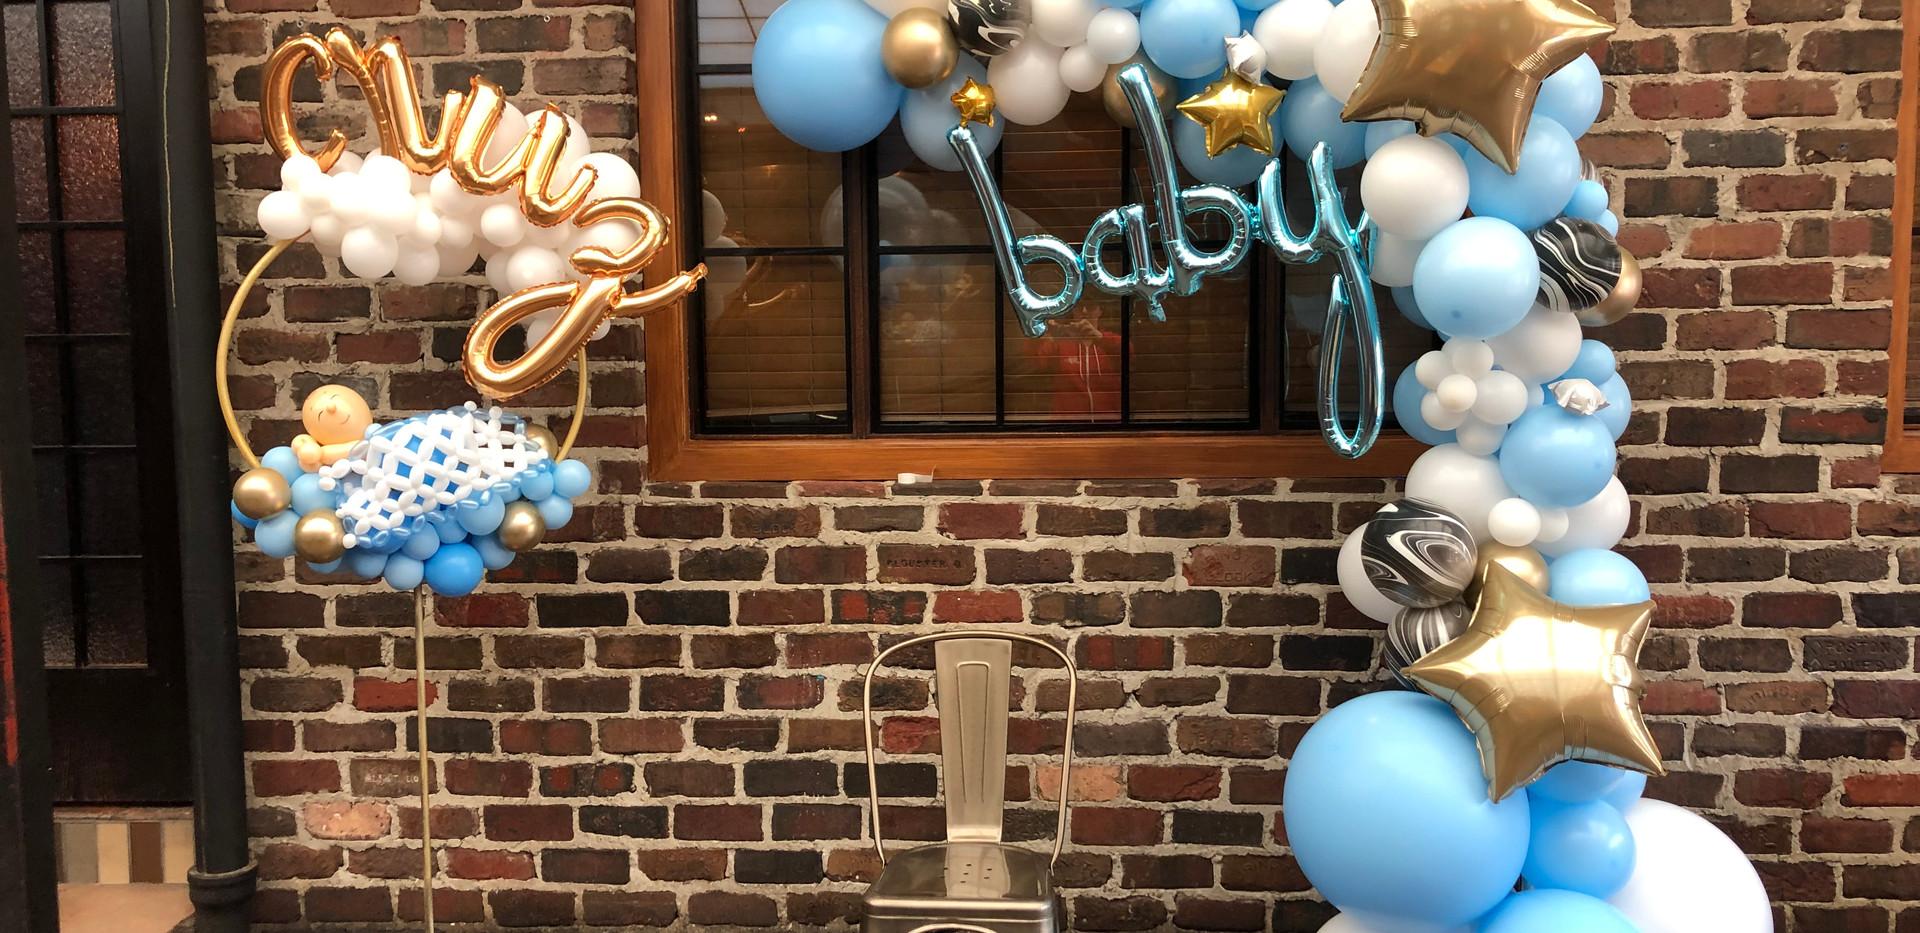 BabyShower Balloons.jpeg